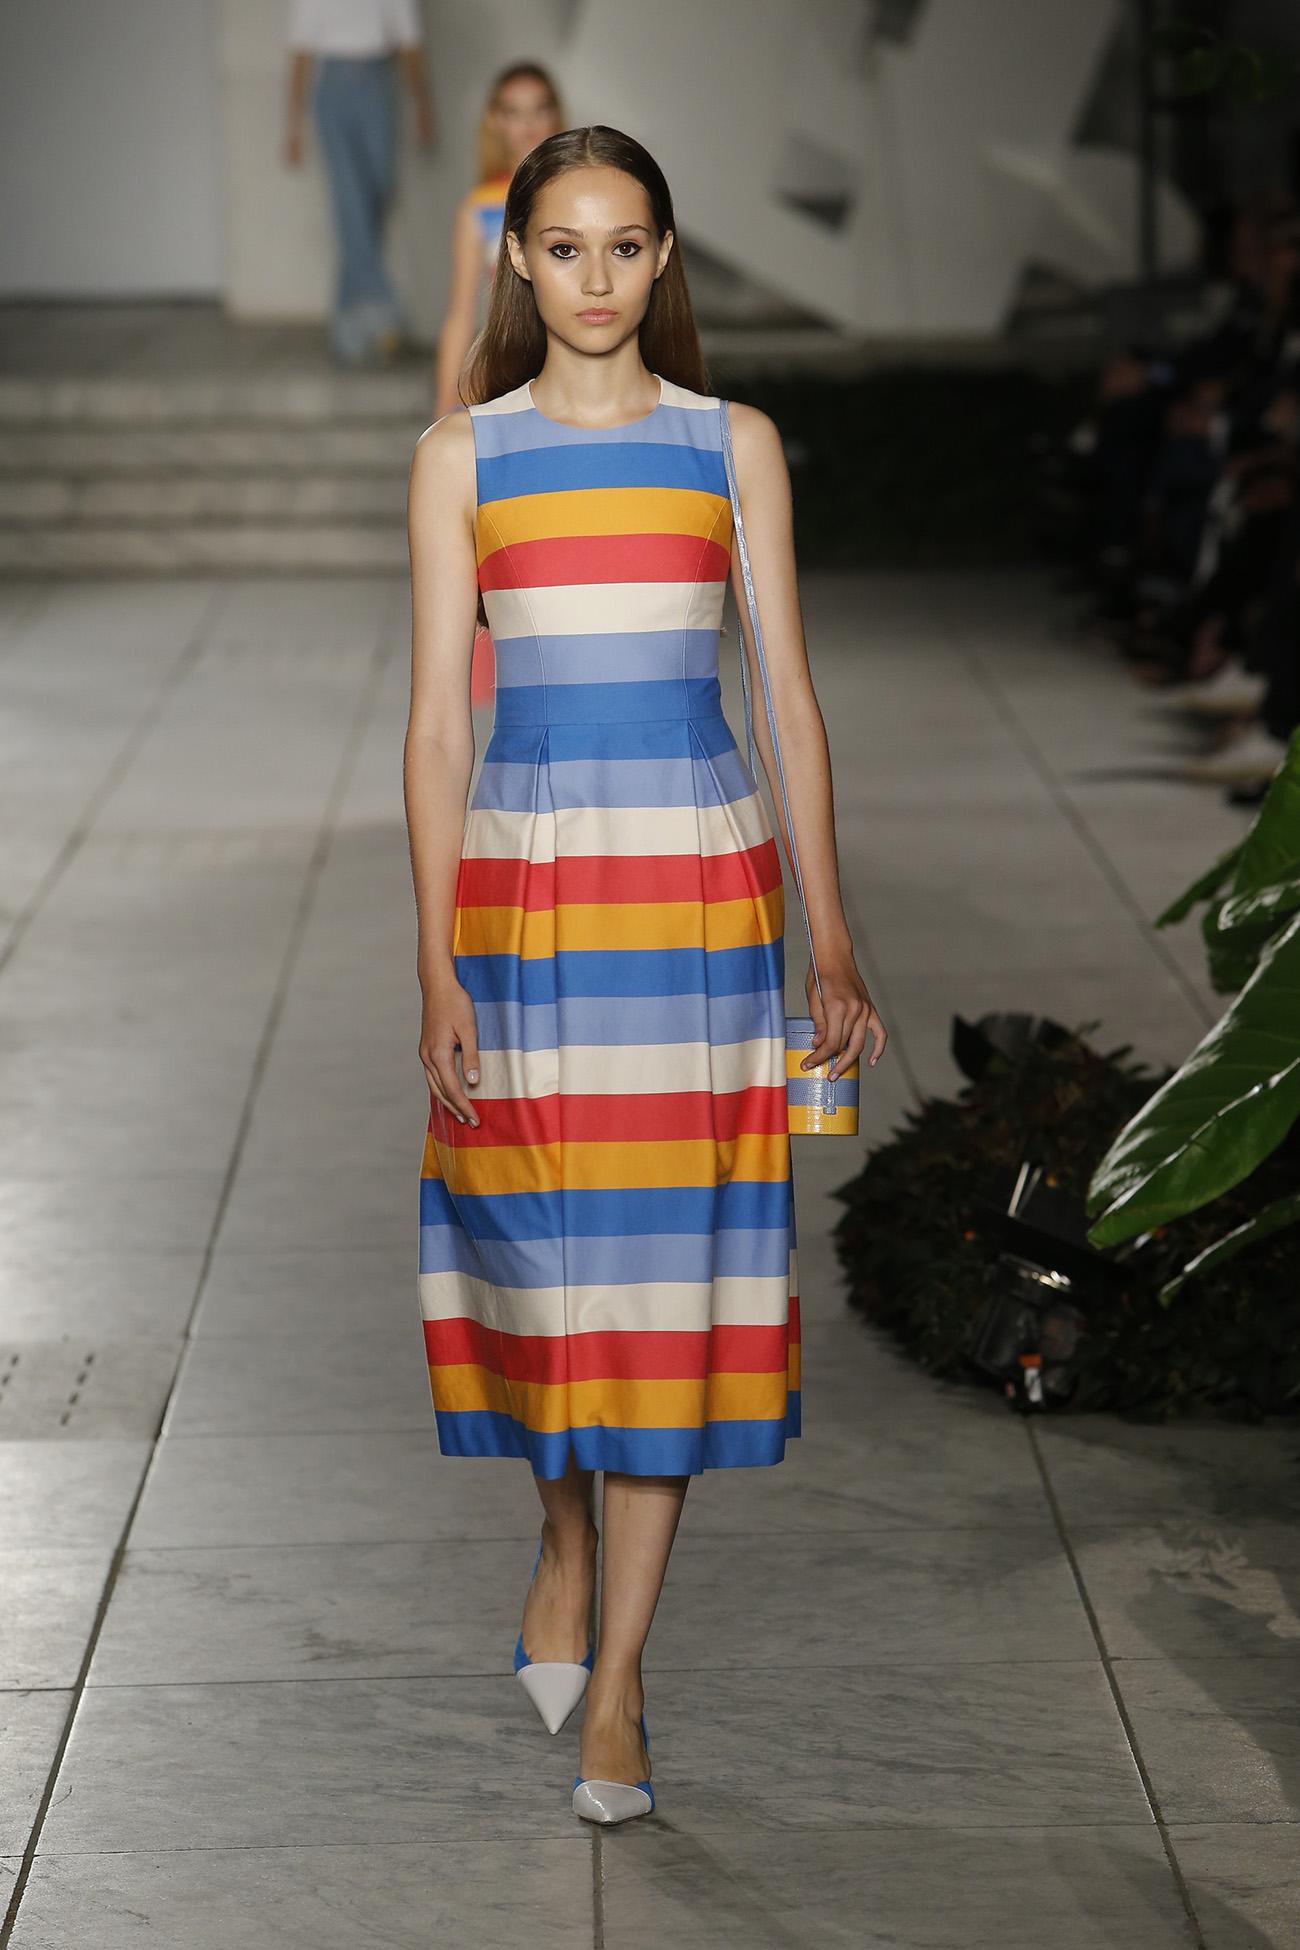 mode fashion vêtement rayures printemps